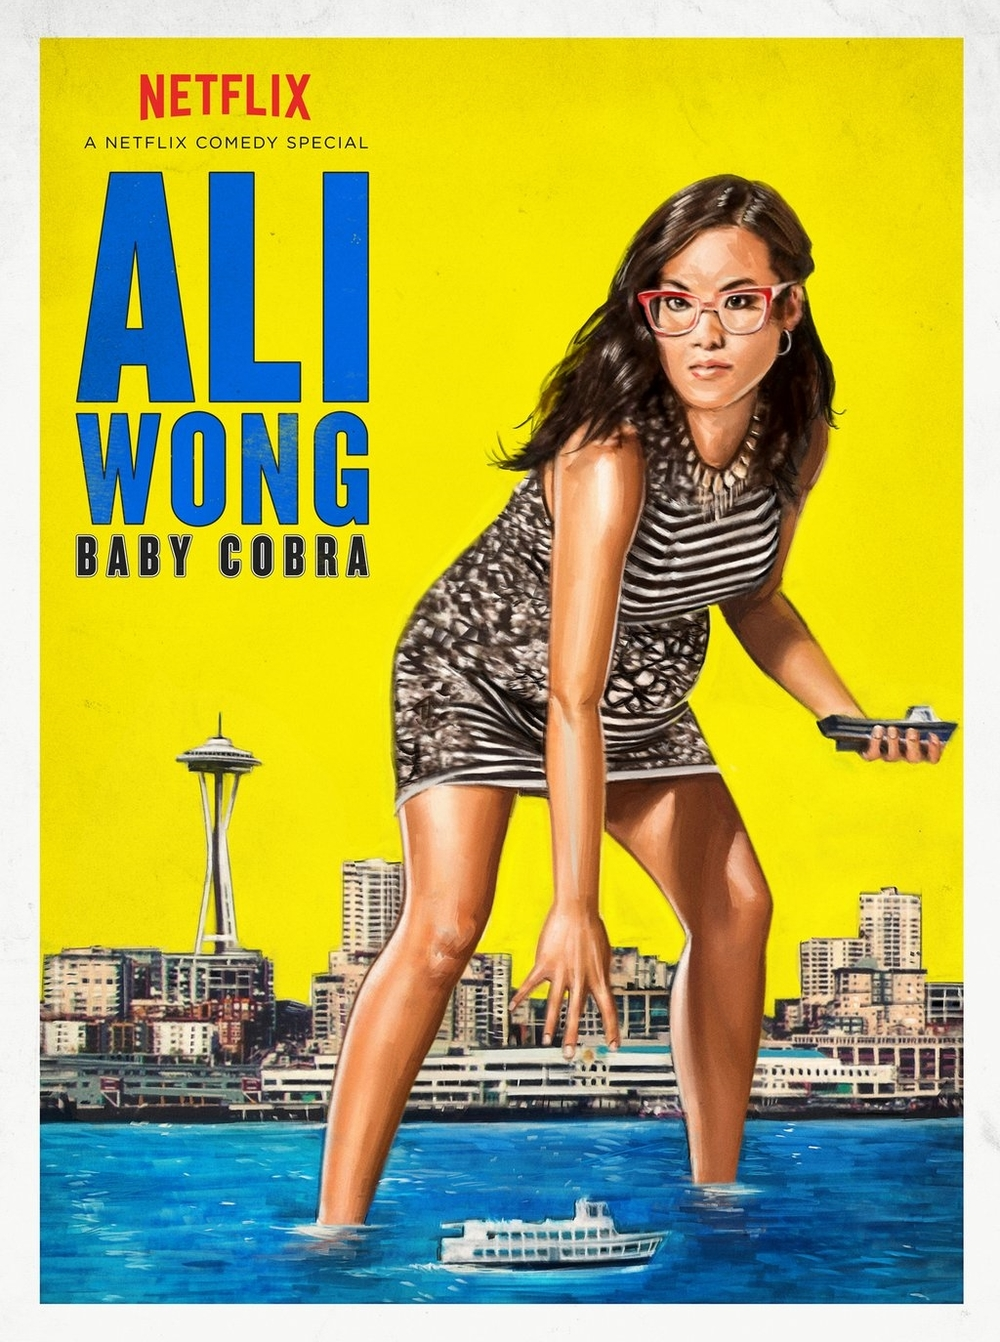 Netflix_AliWong_KeyArt_Poster.jpeg